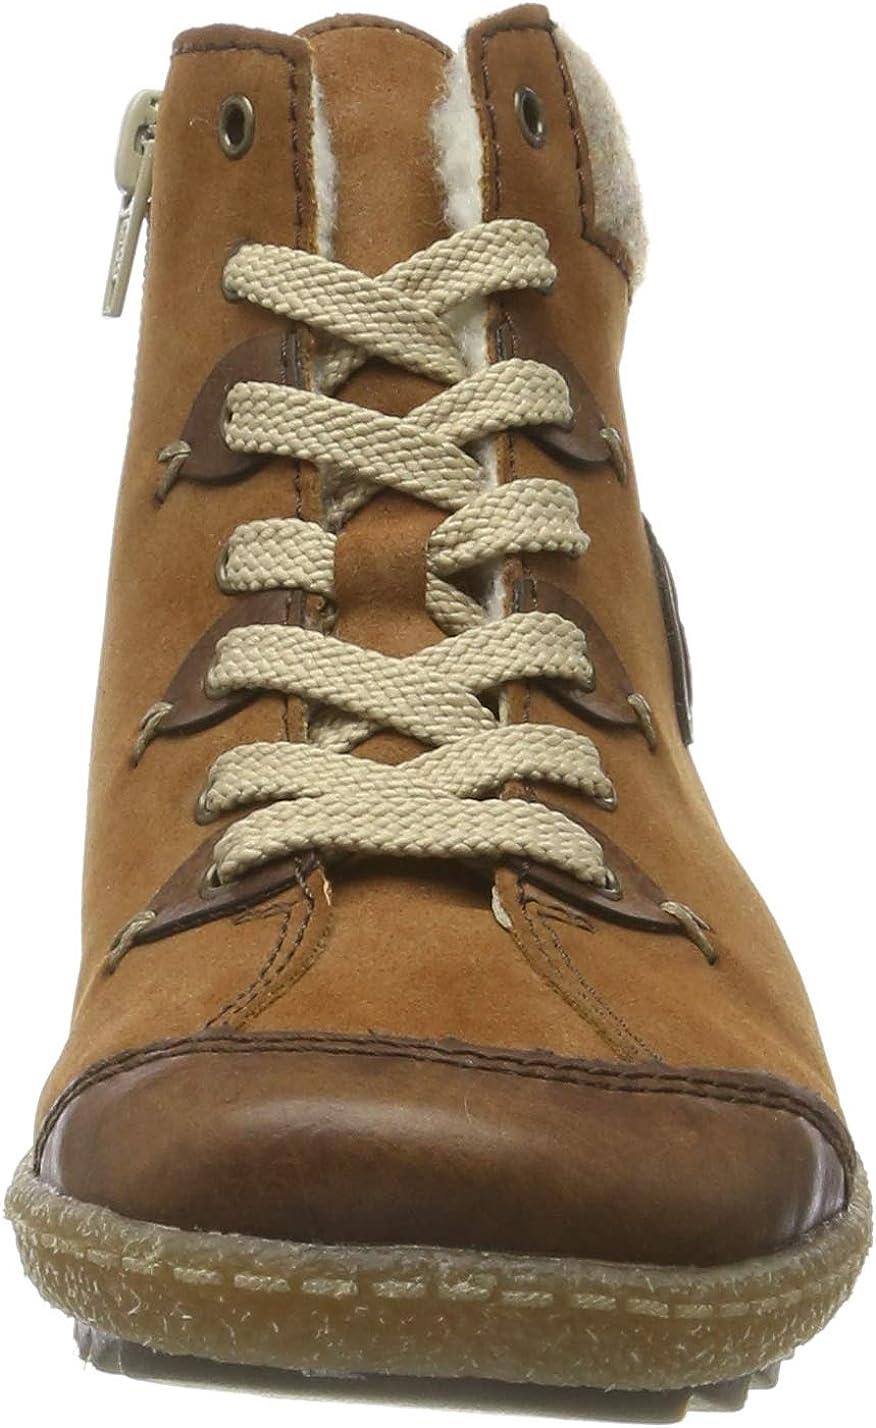 Rieker Herbst/Winter, Sneaker a Collo Alto Donna Marrone Chestnut Reh Wood 23